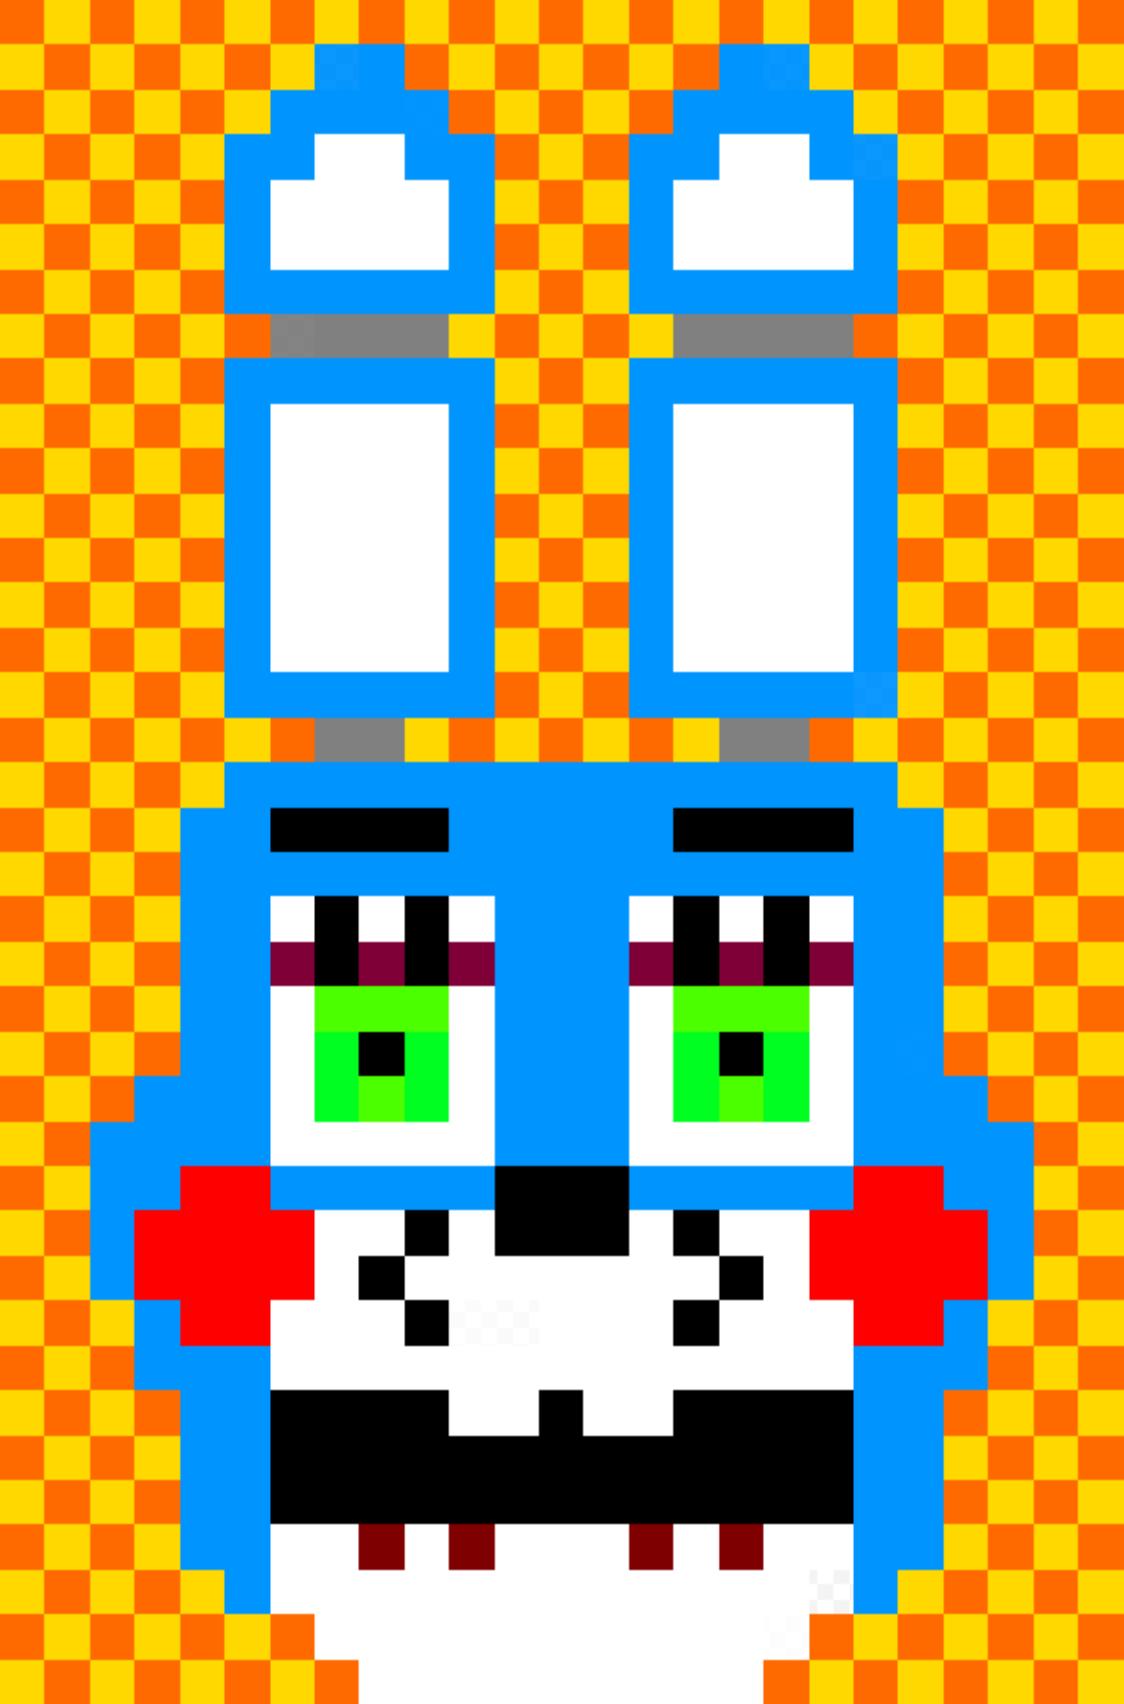 Toy Bonnie Head Pixel Art By Dimensionalskull On Deviantart